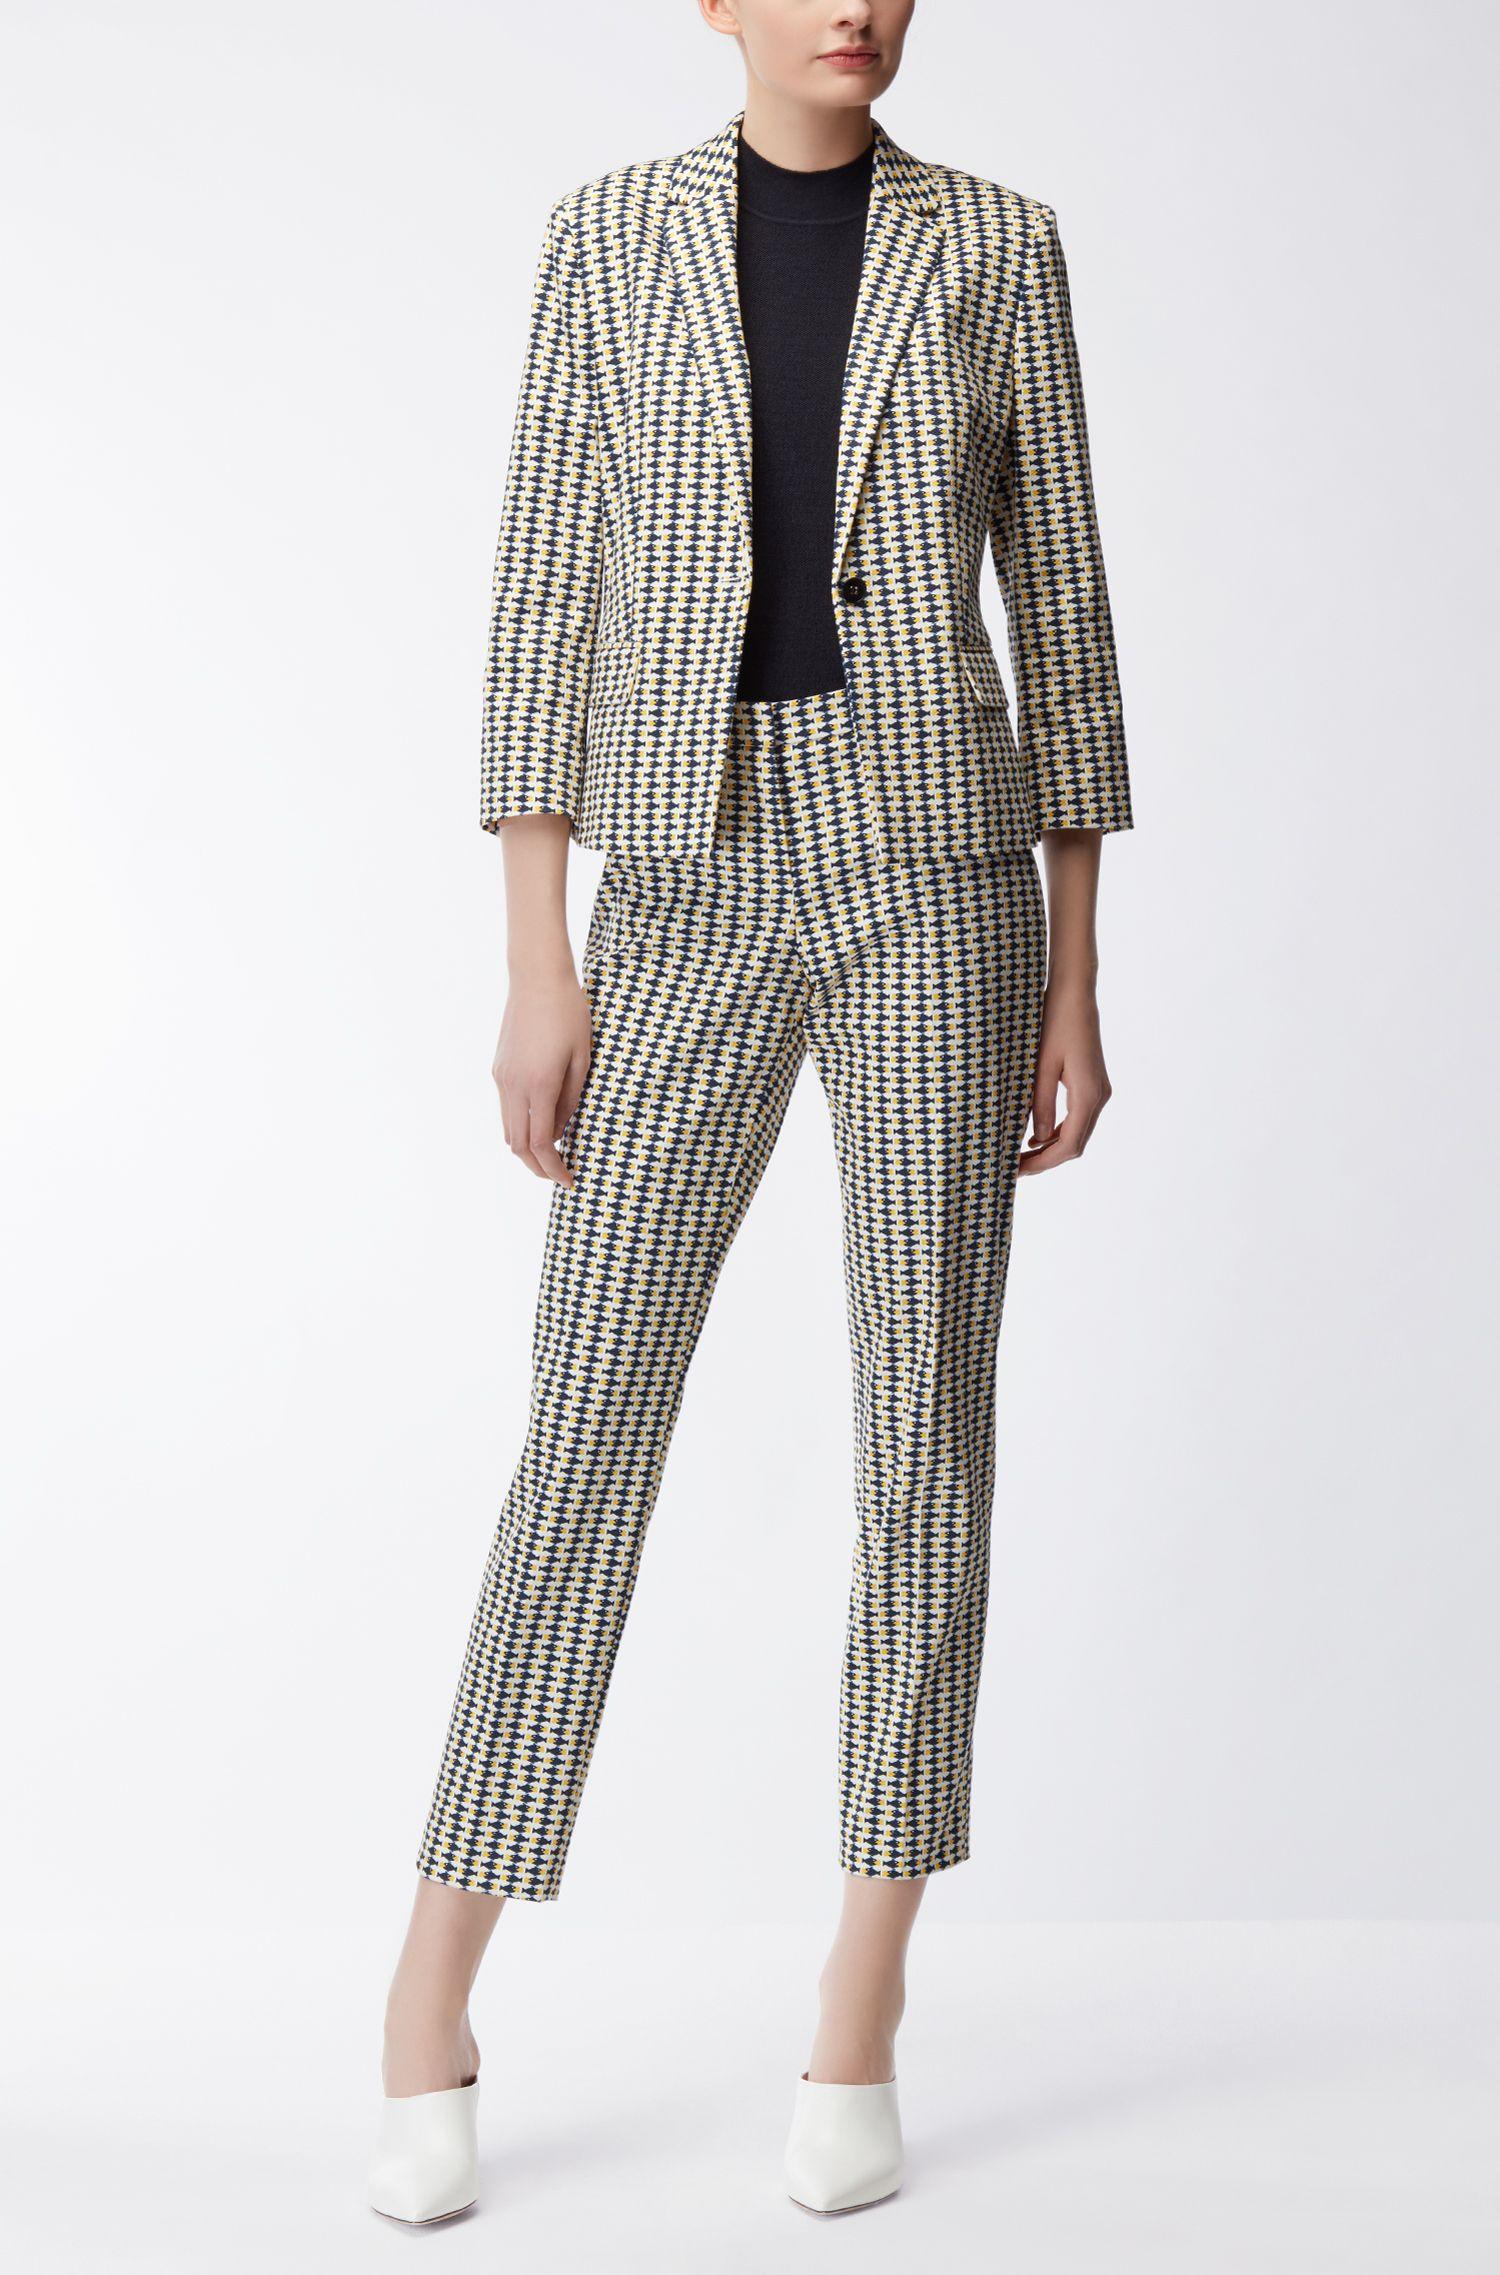 Jersey sin mangas en lana de merino con un moderno tejido de piqué